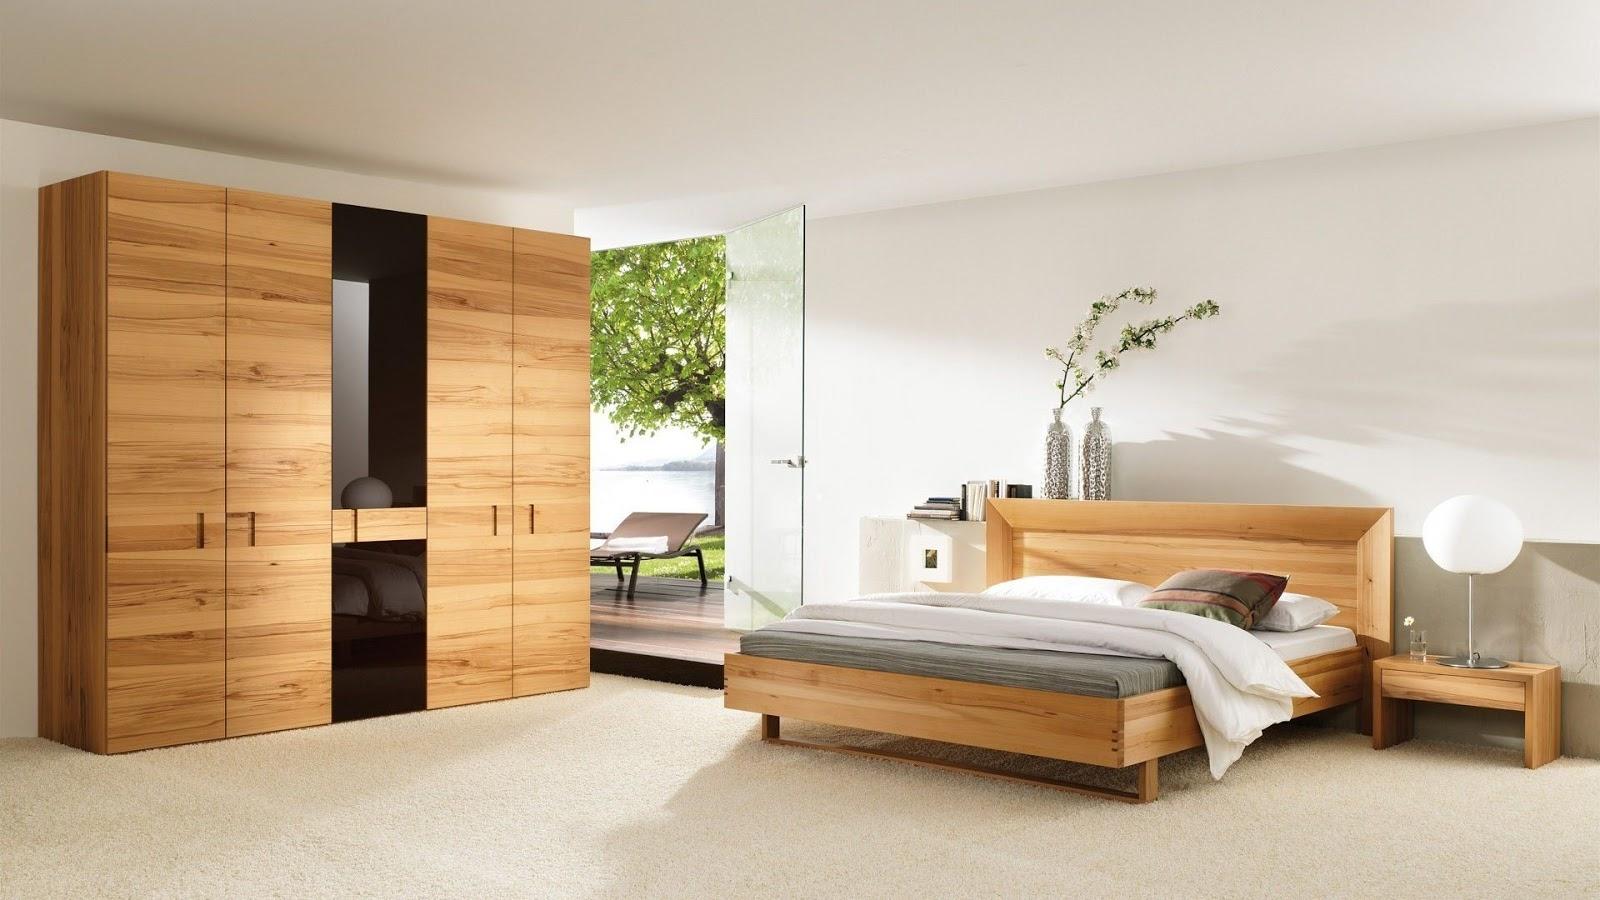 Brown Dresser An Excellent Additional Bedroom Modern Furniture inside Brilliant in addition to Lovely minimalist bedroom dresser intended for Residence - Man 17